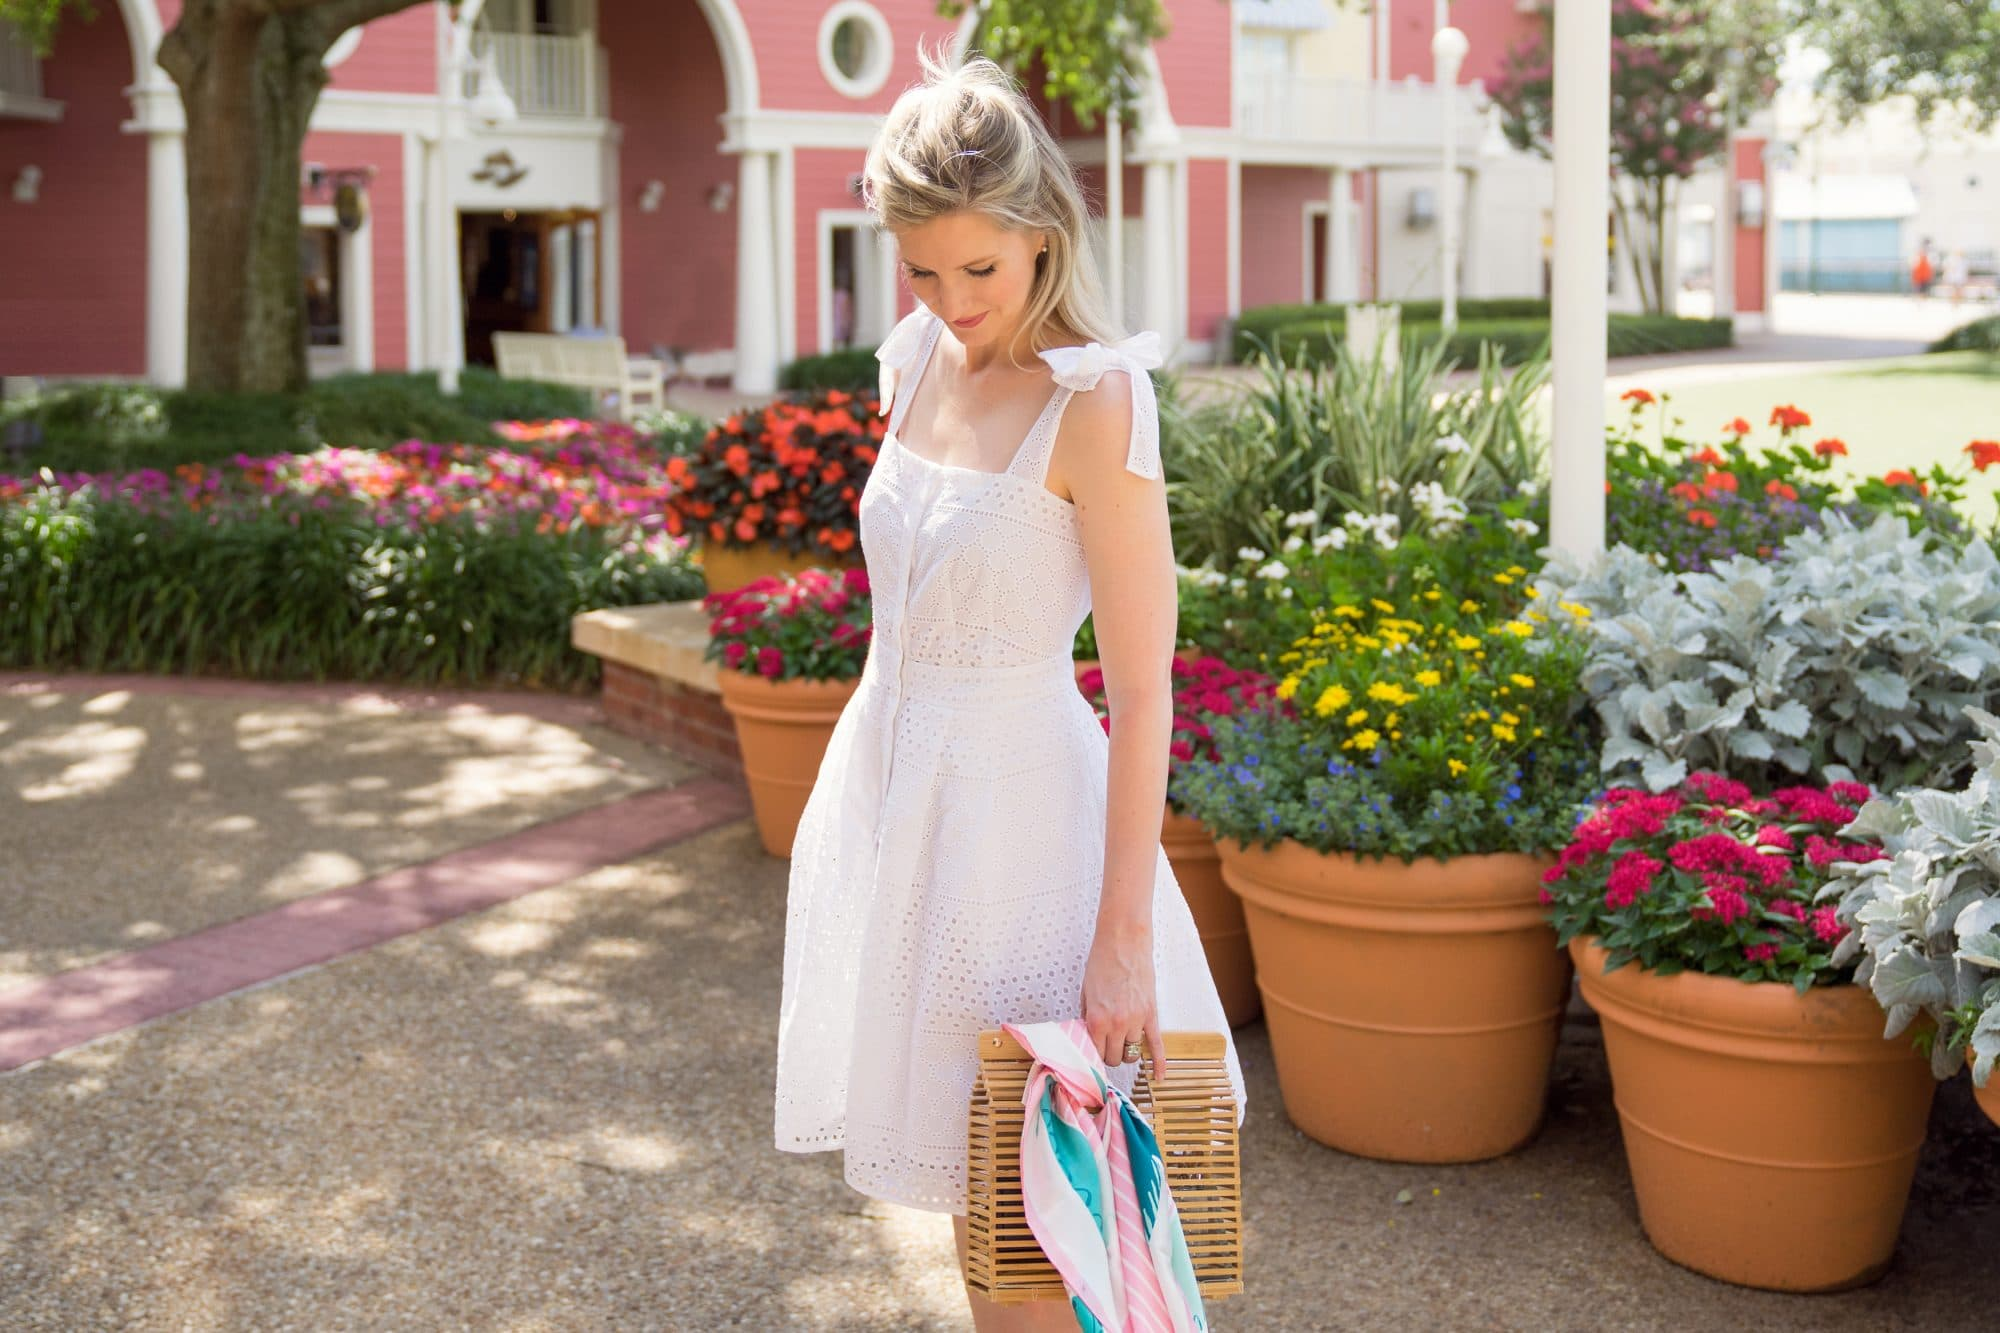 Lord & Taylor White Eyelet Bow Dress | Rachel Roy - www.ashleybrookedesigns.com